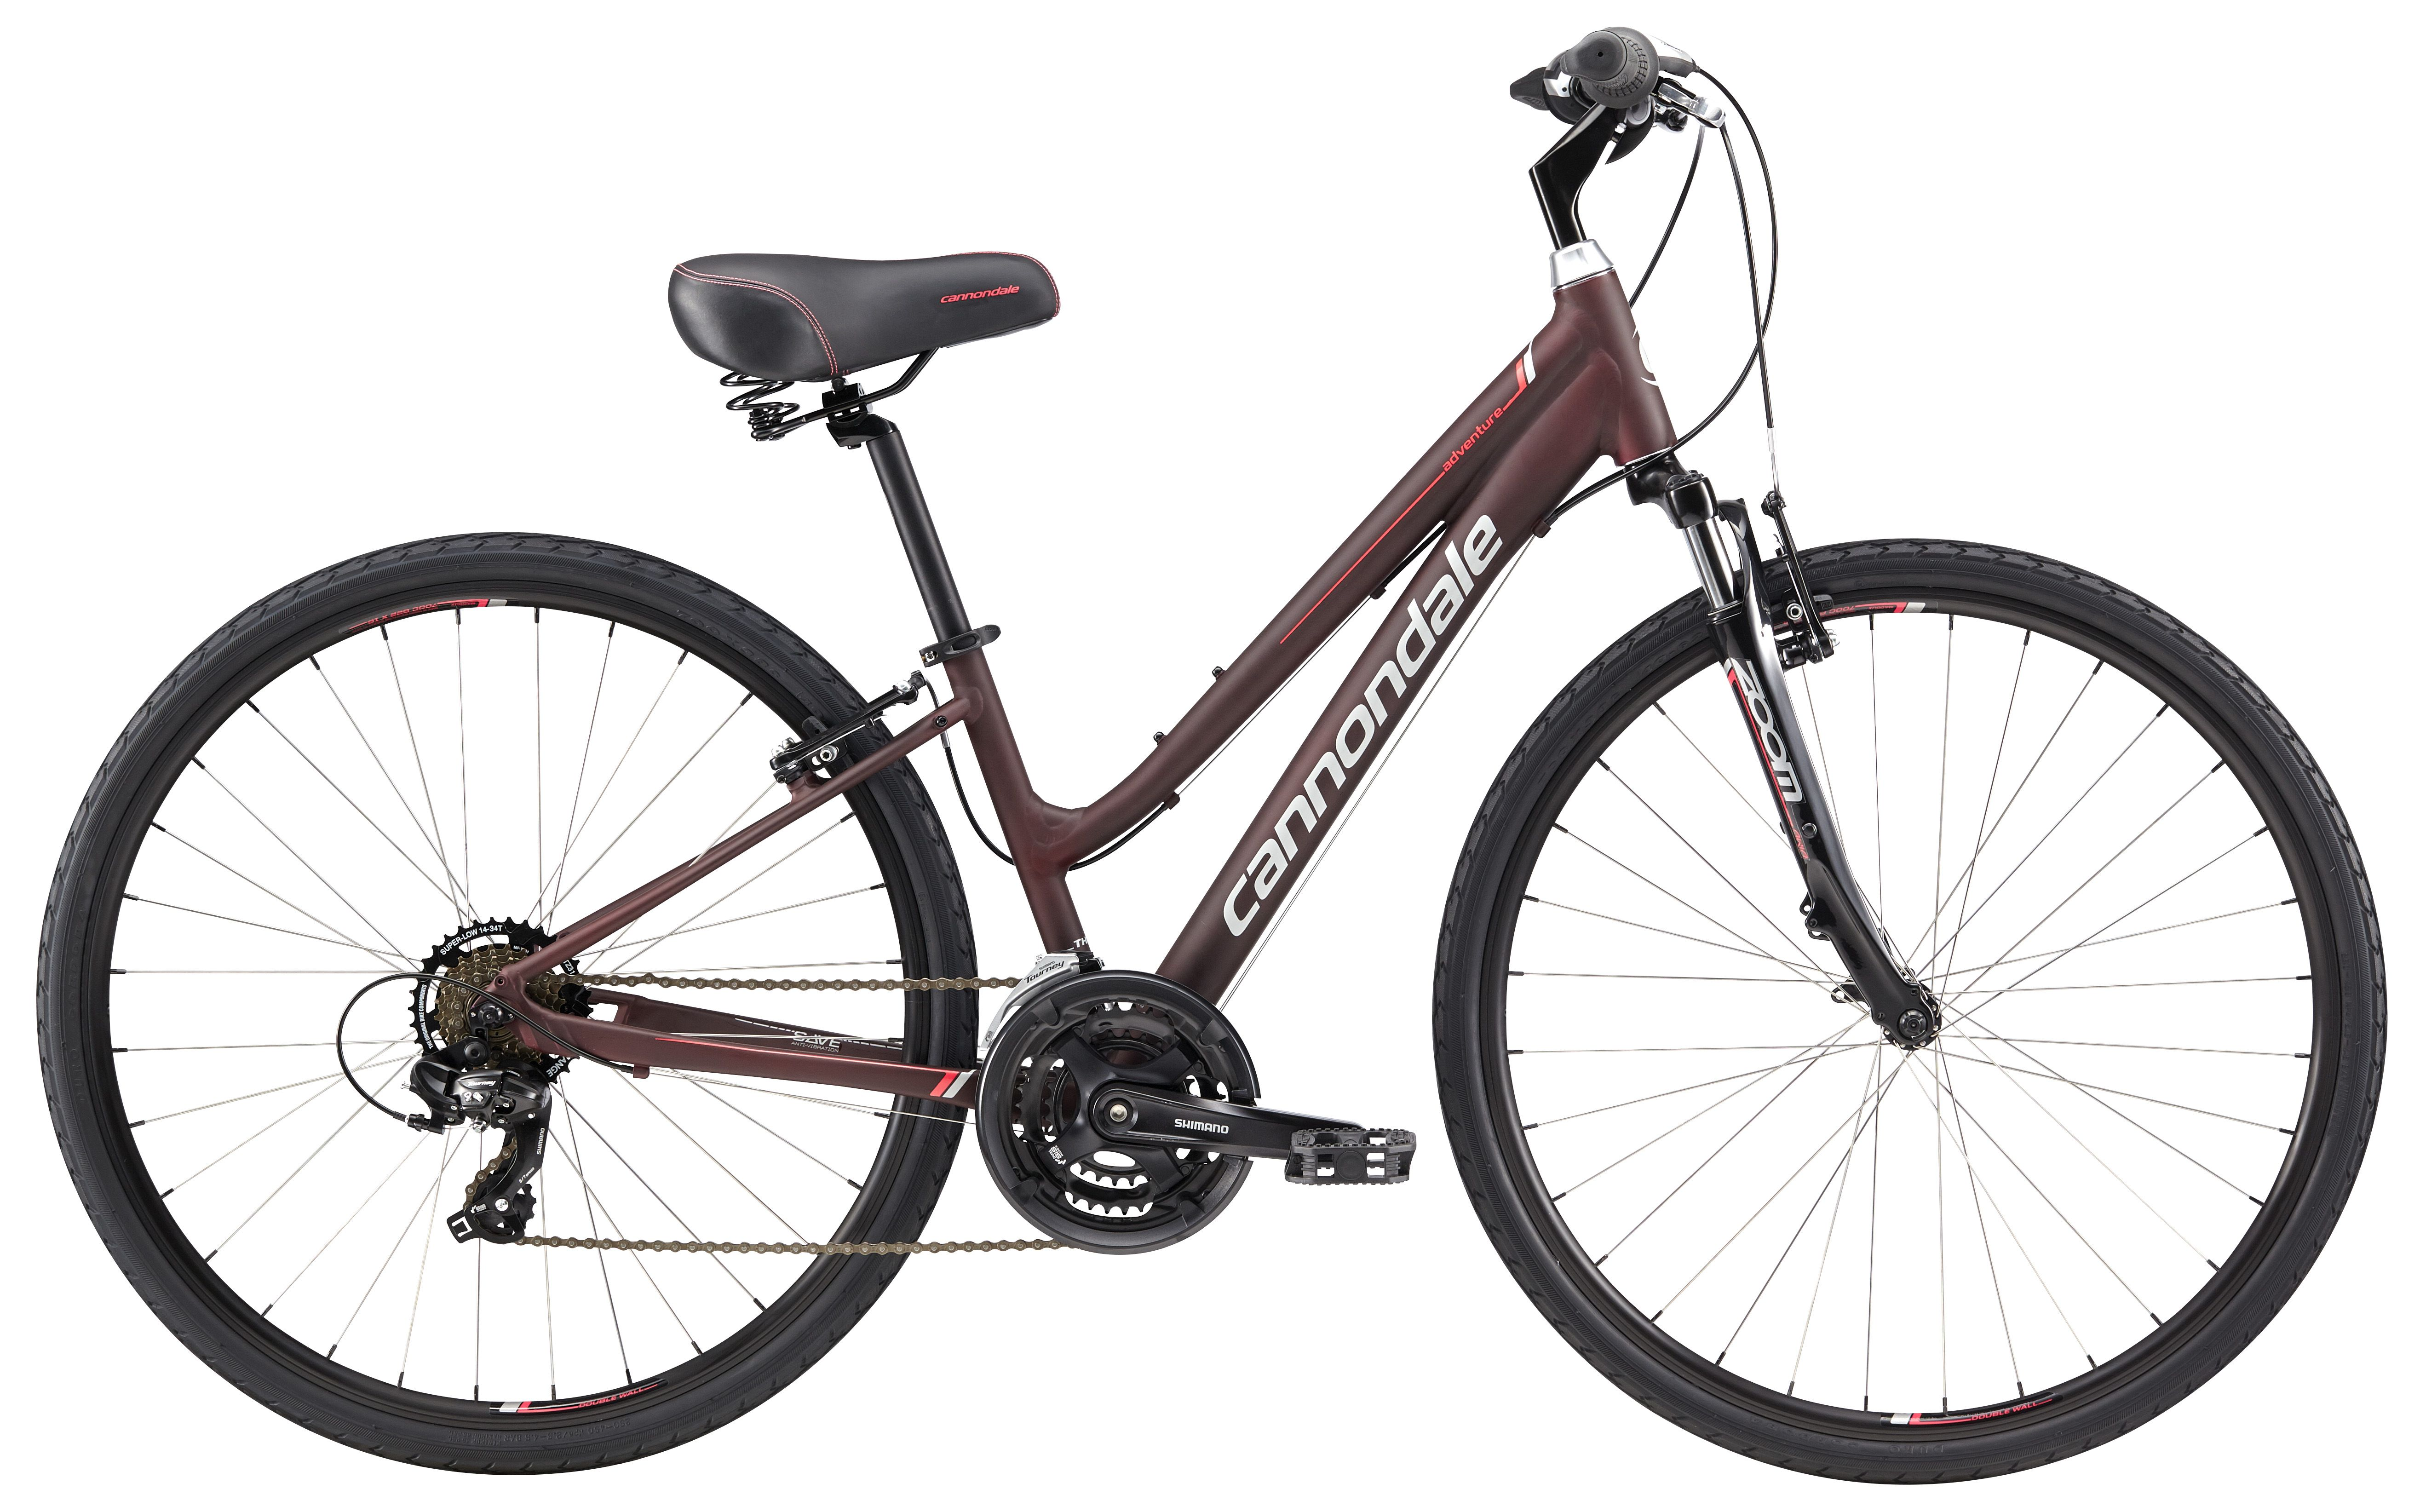 a8f2c3f6bf2 Althea 2 Women's Bike - 2016   *Sporting Goods*   Bicycle, Cycling bikes,  Urban bike